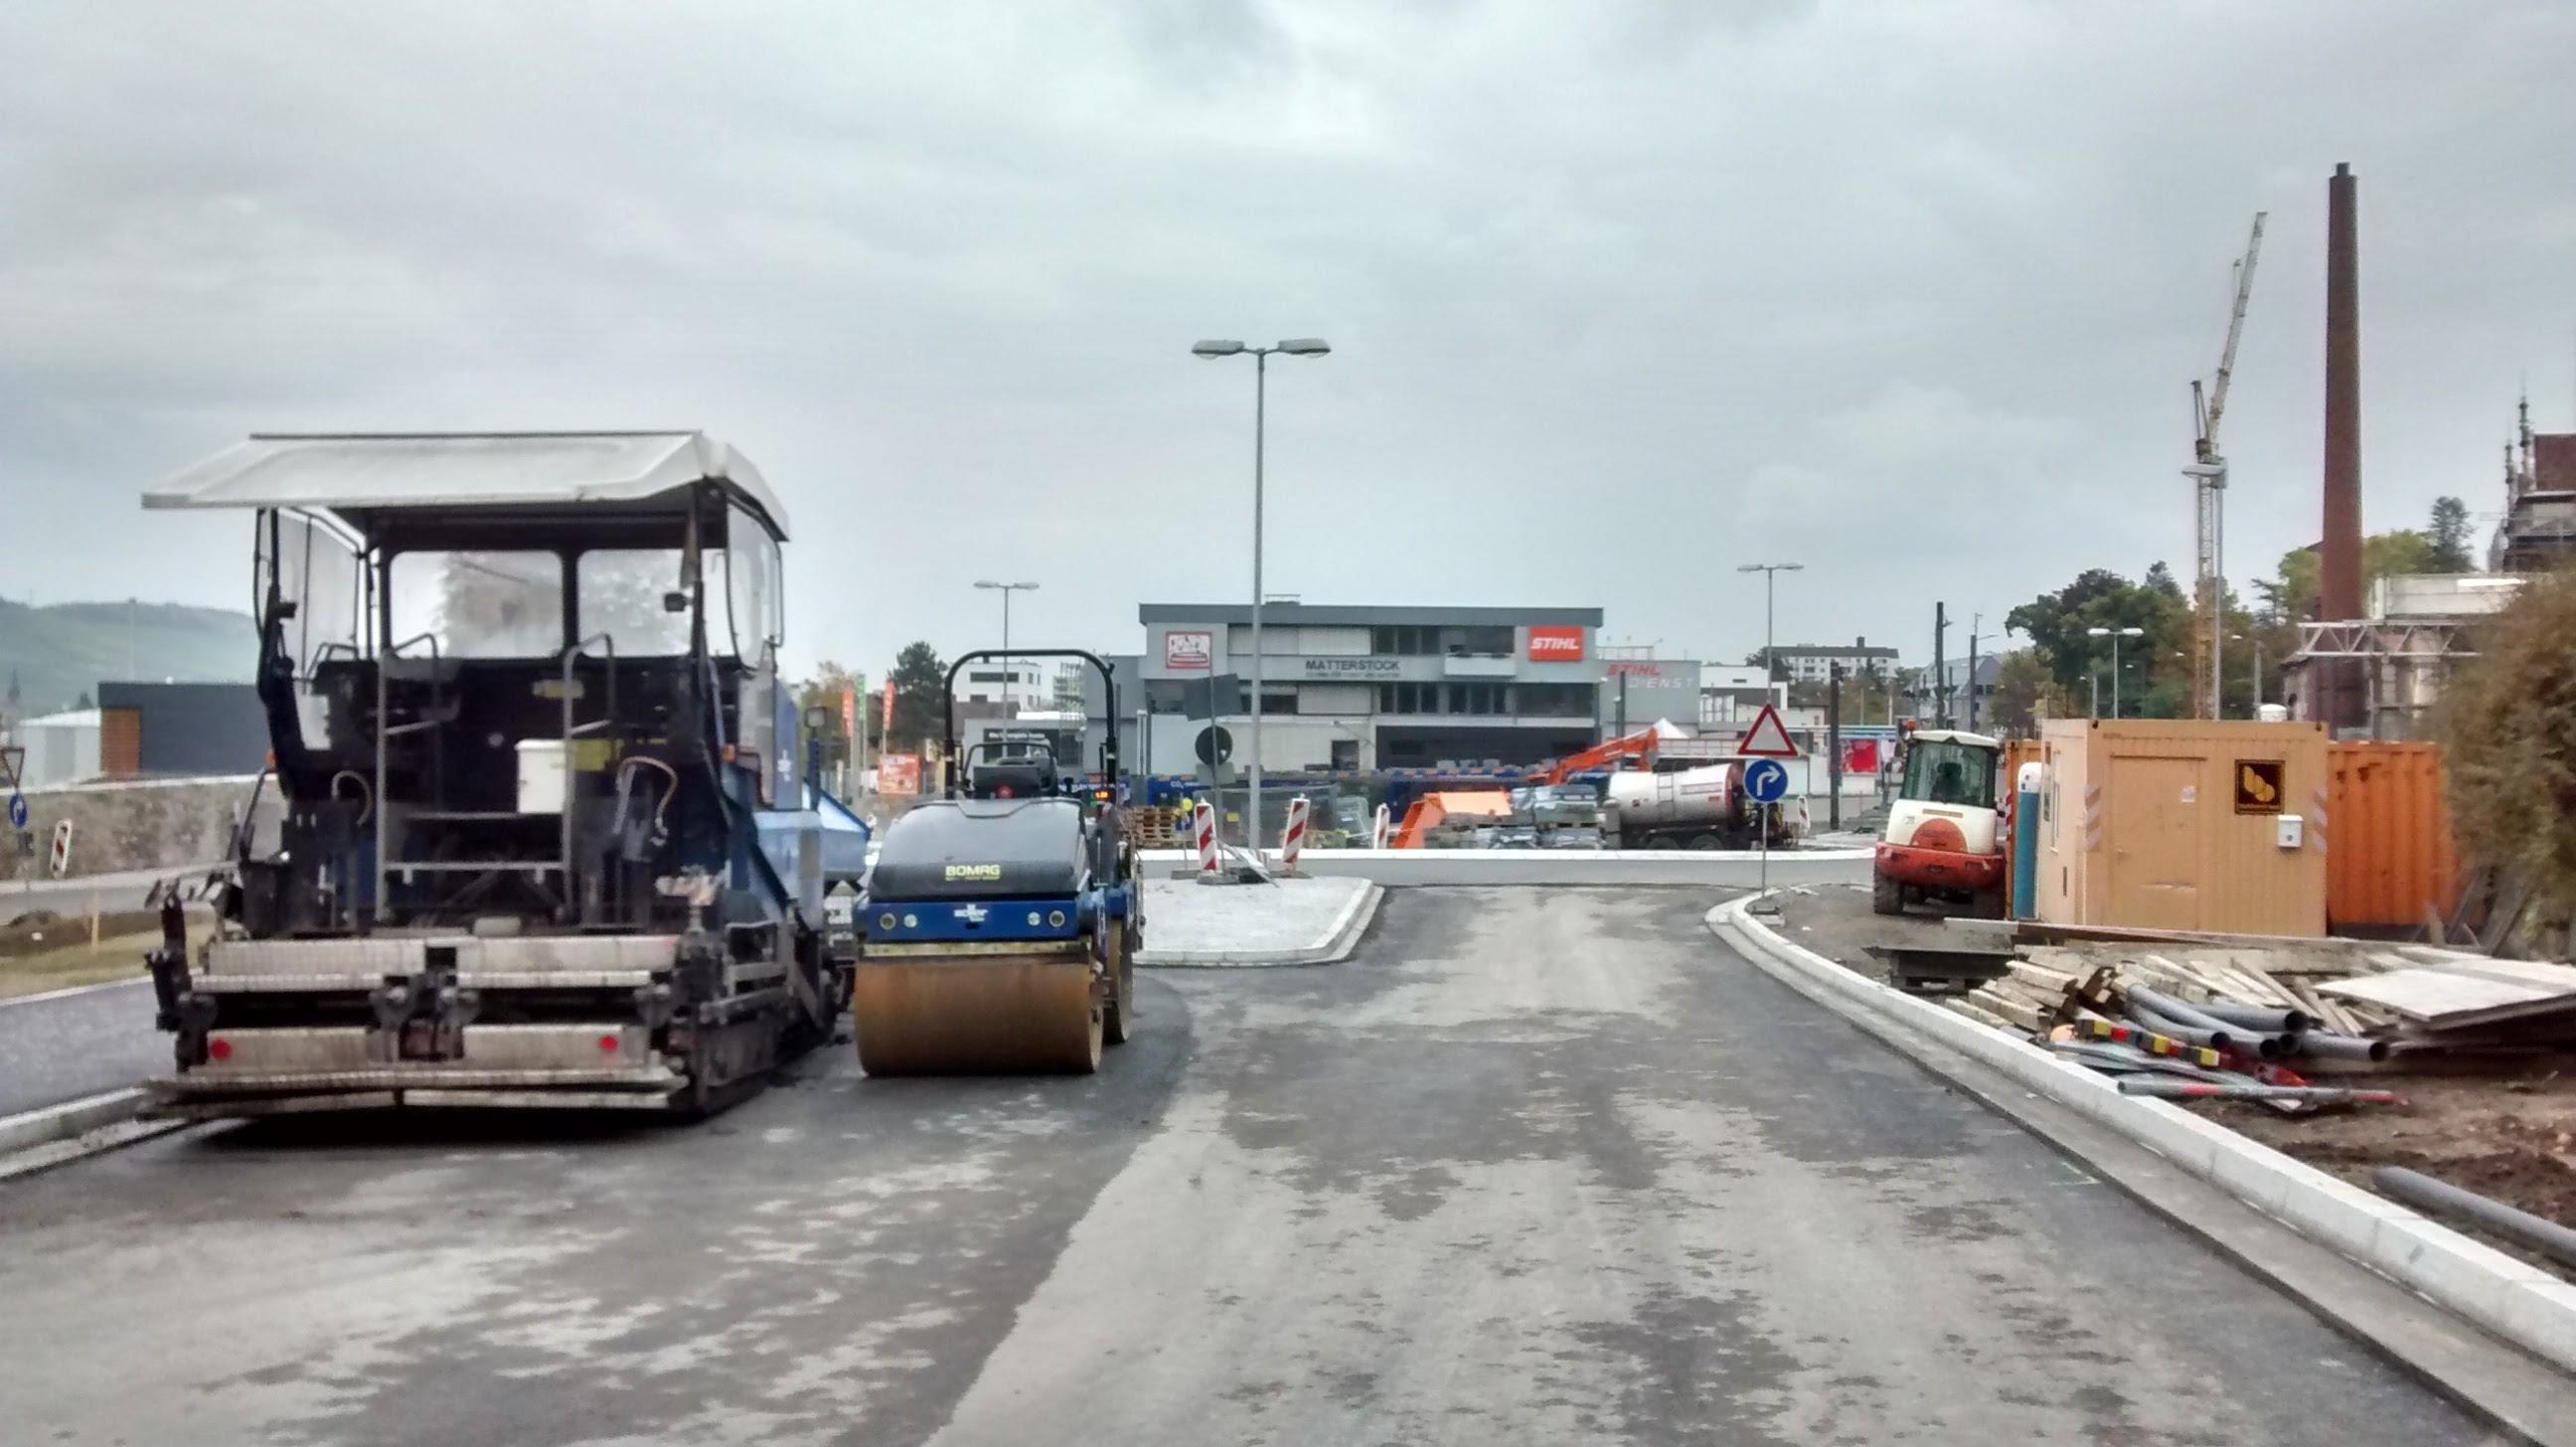 Blick in Richtung Zellerau - der Kreisverkehr funktioniert schon...